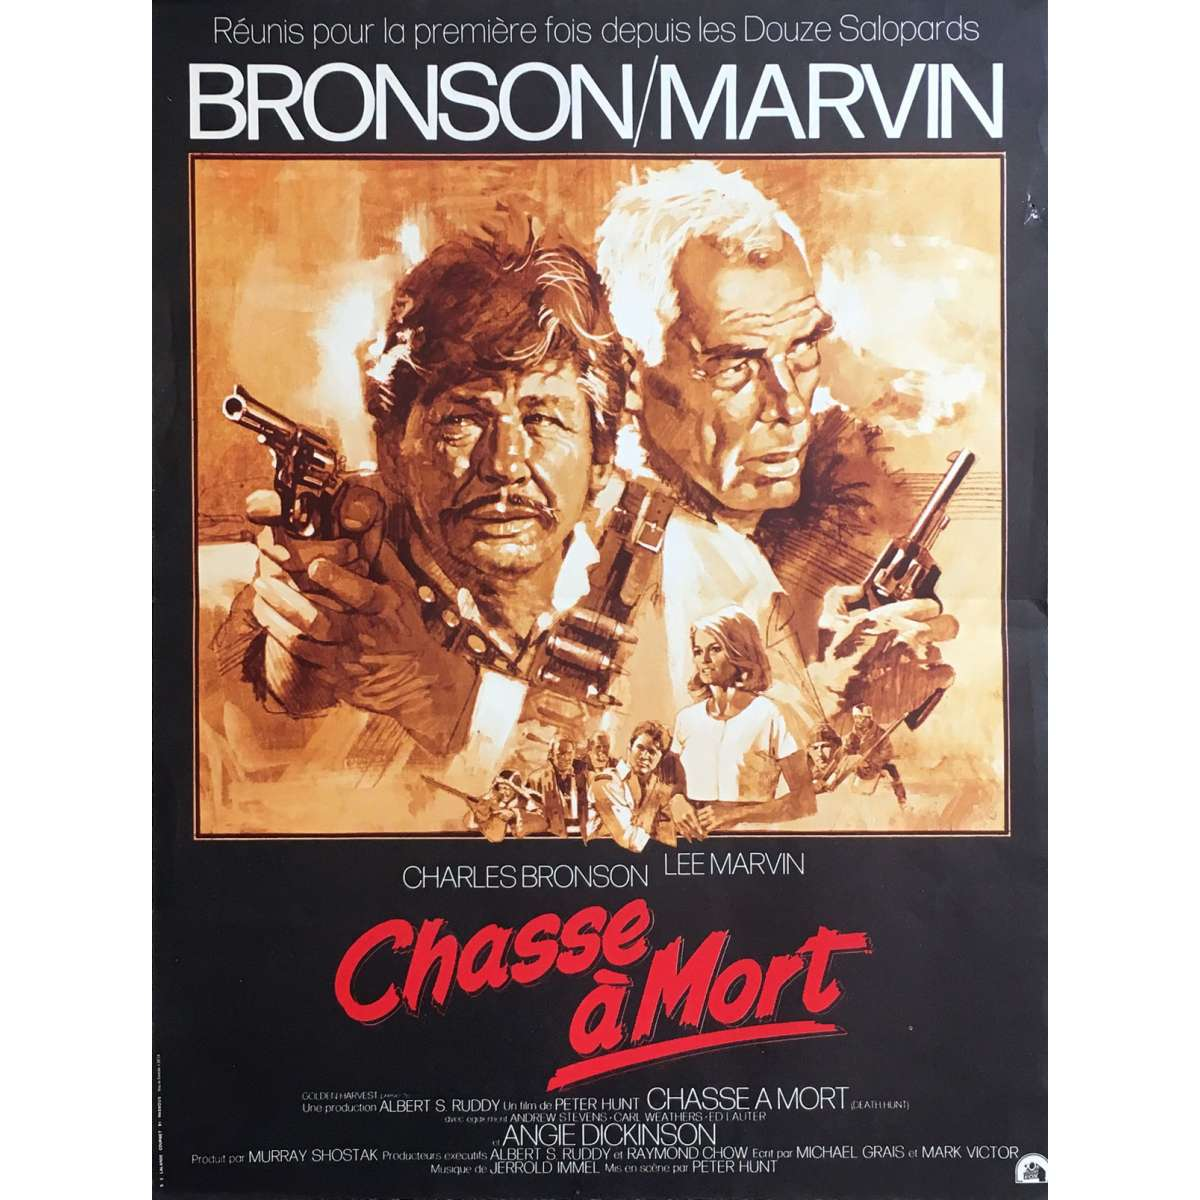 Death hunt Charles Bronson Lee Marvin movie poster print